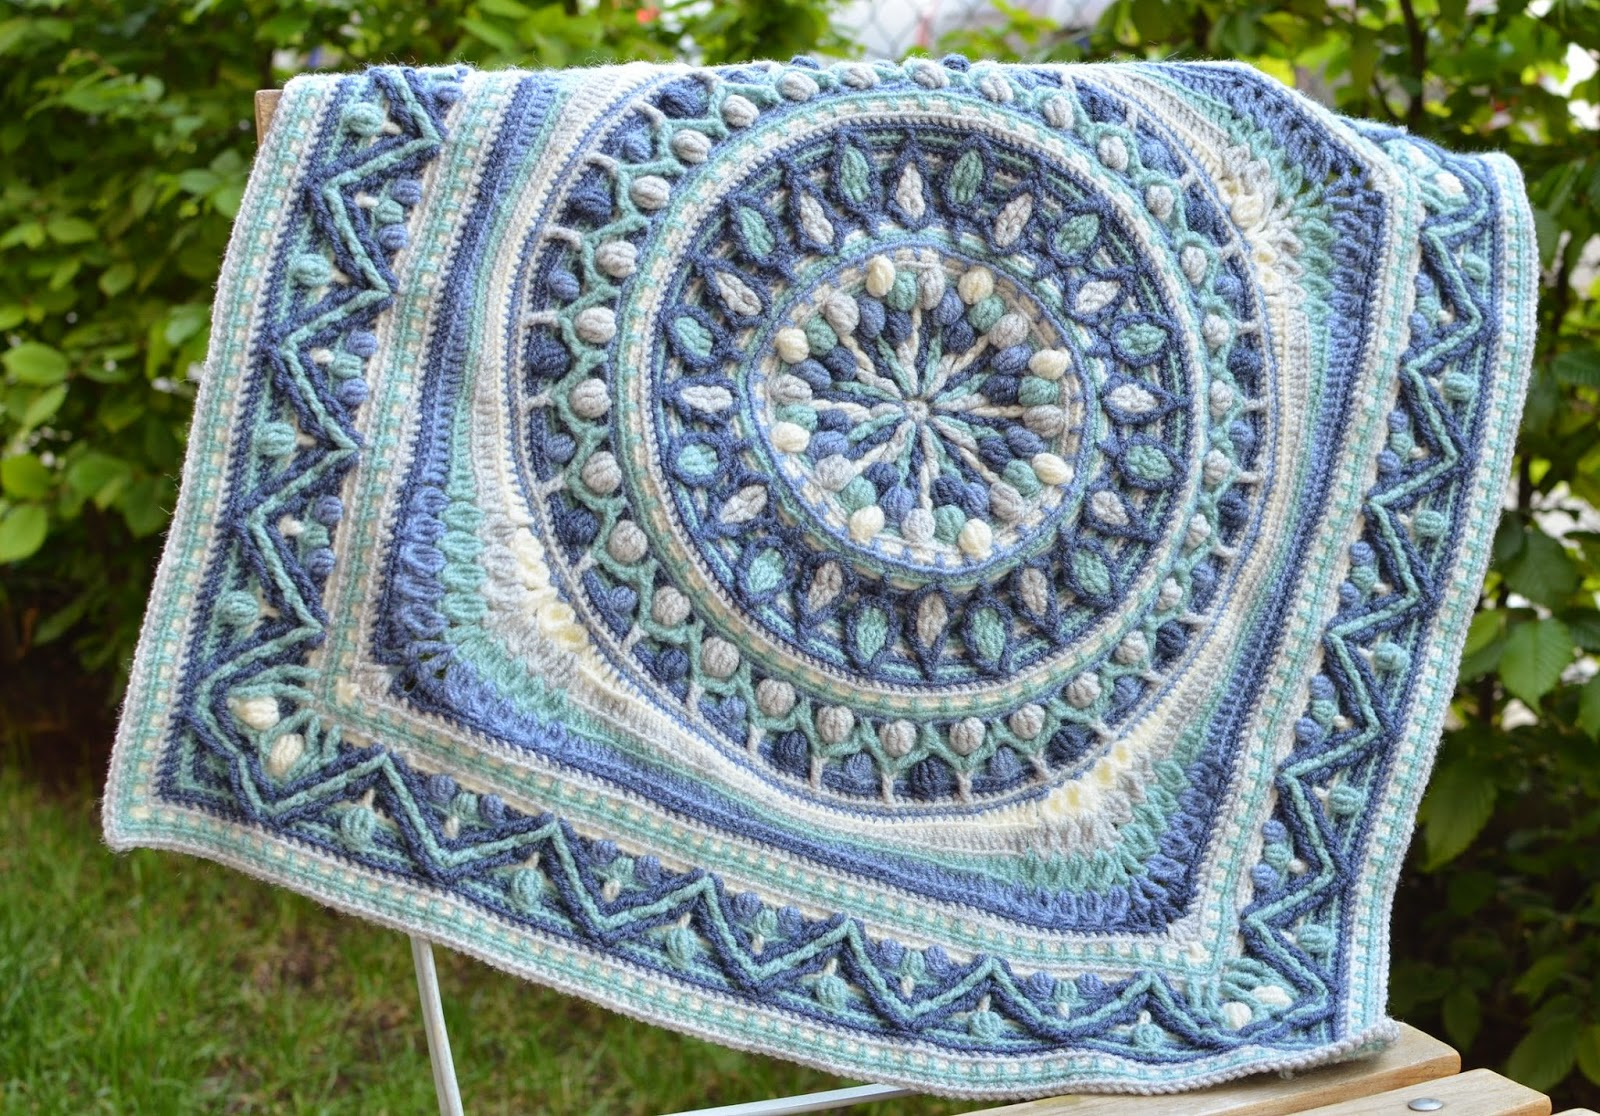 Large Crochet Squares or Second Life of Dandelion Mandala ...